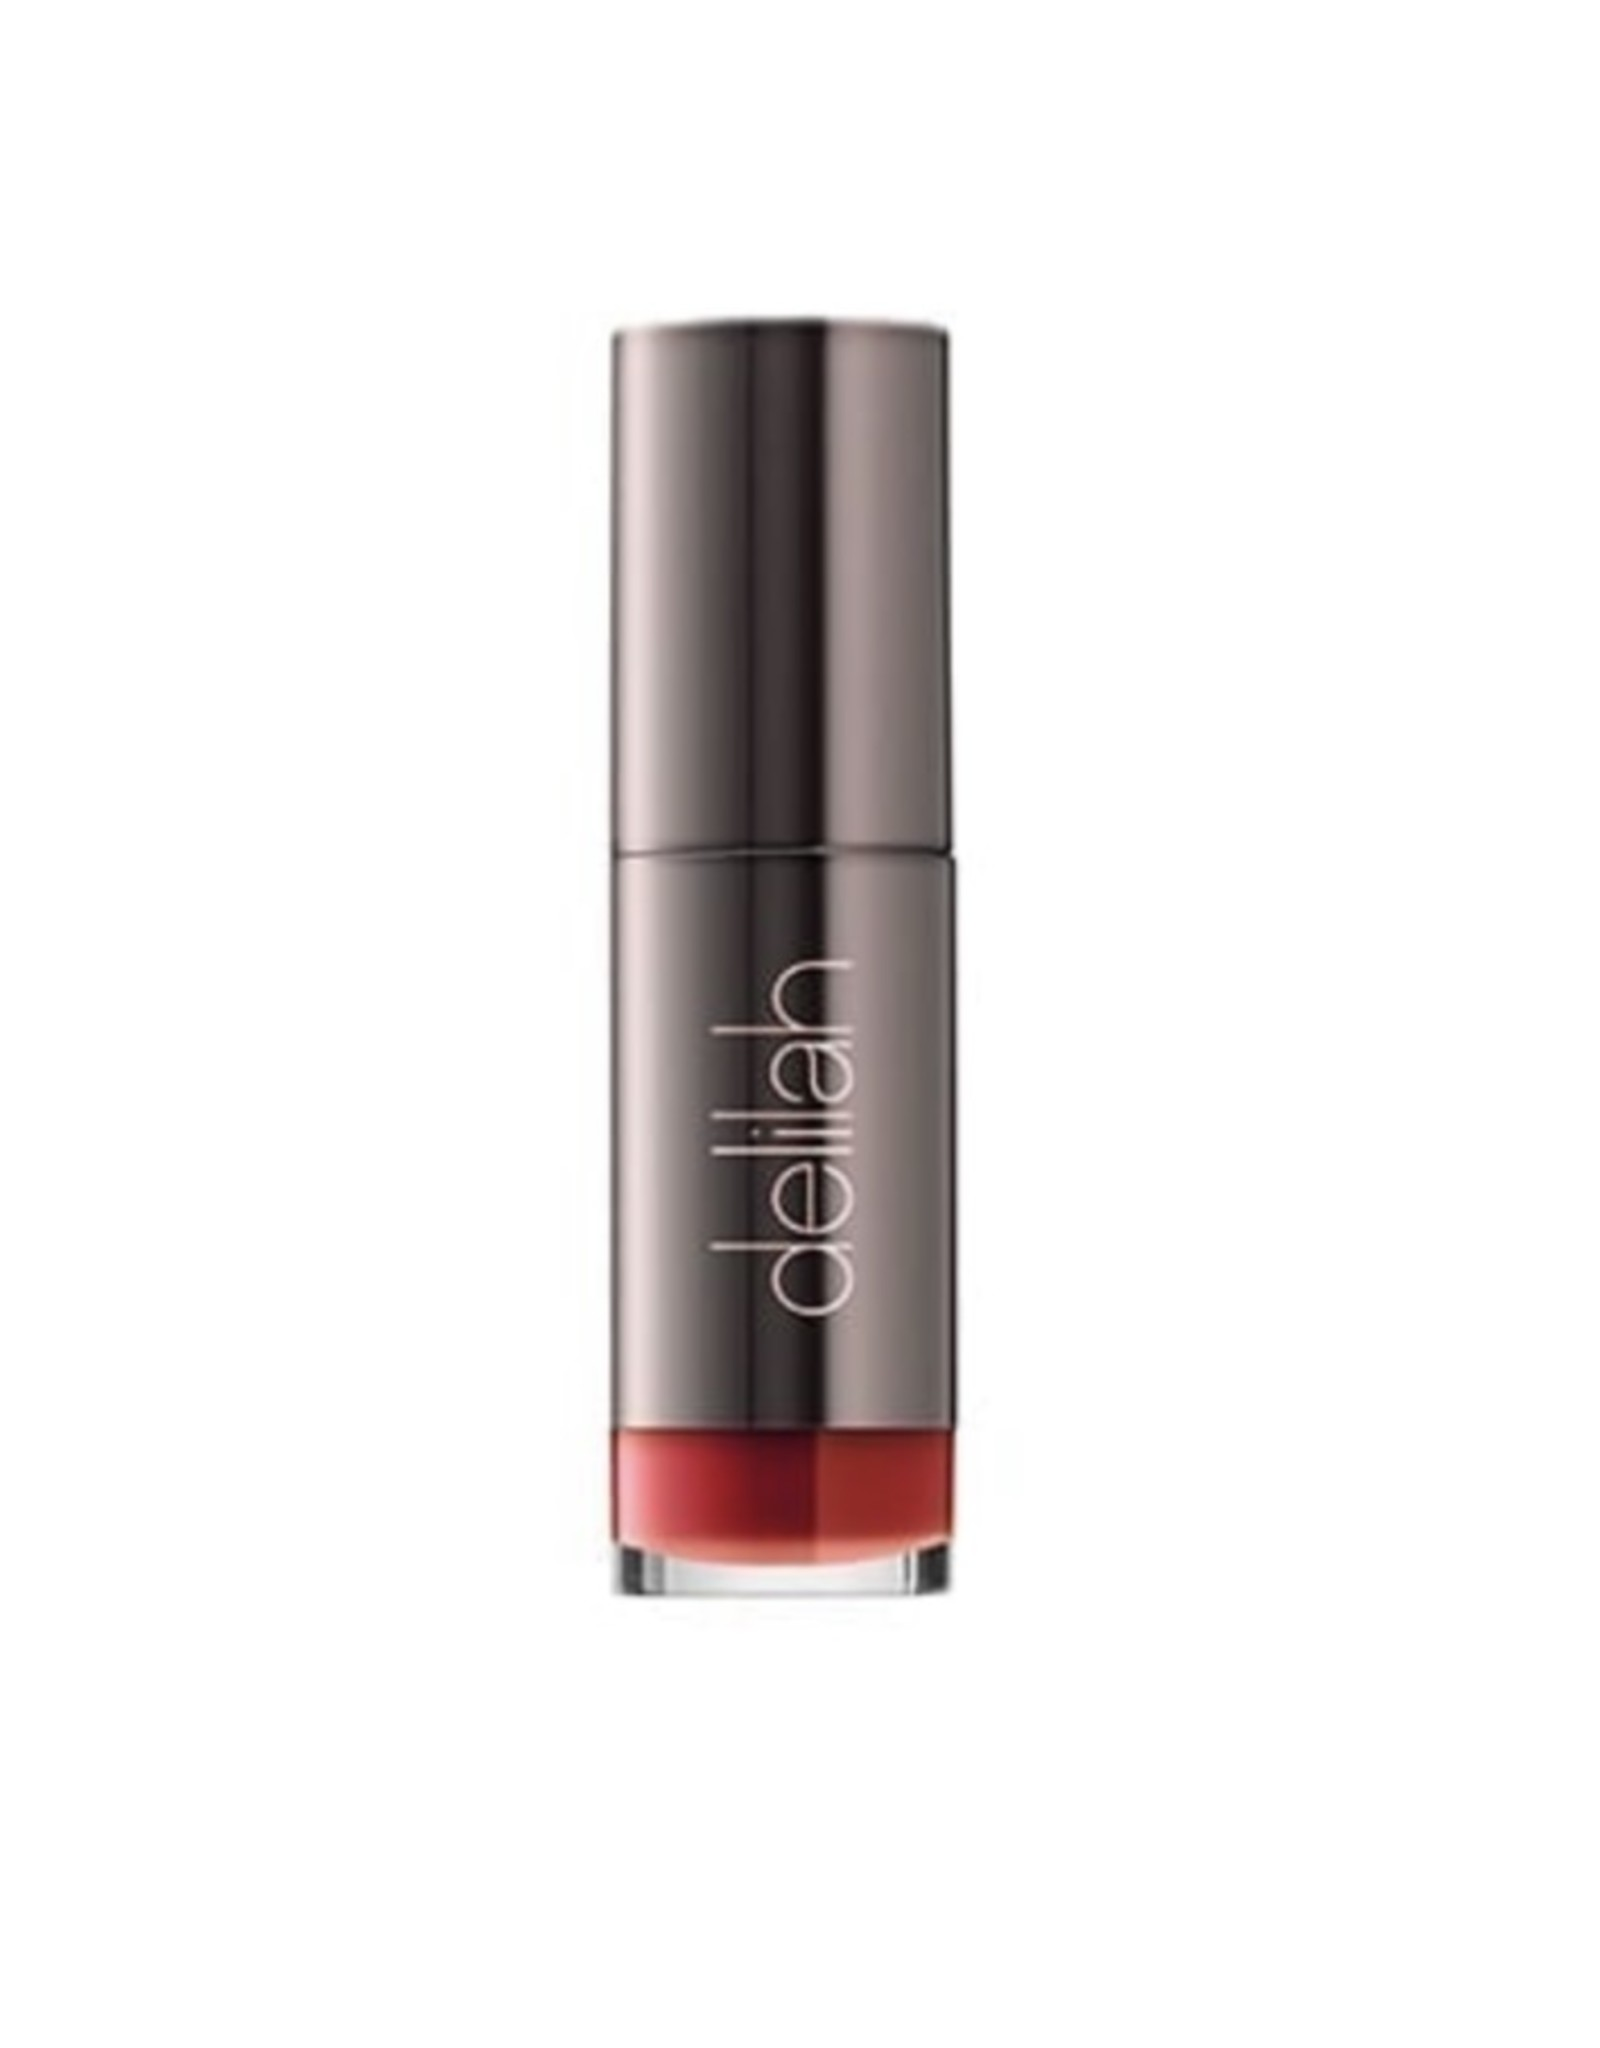 Delilah Colour Intense Liquid Lipstick